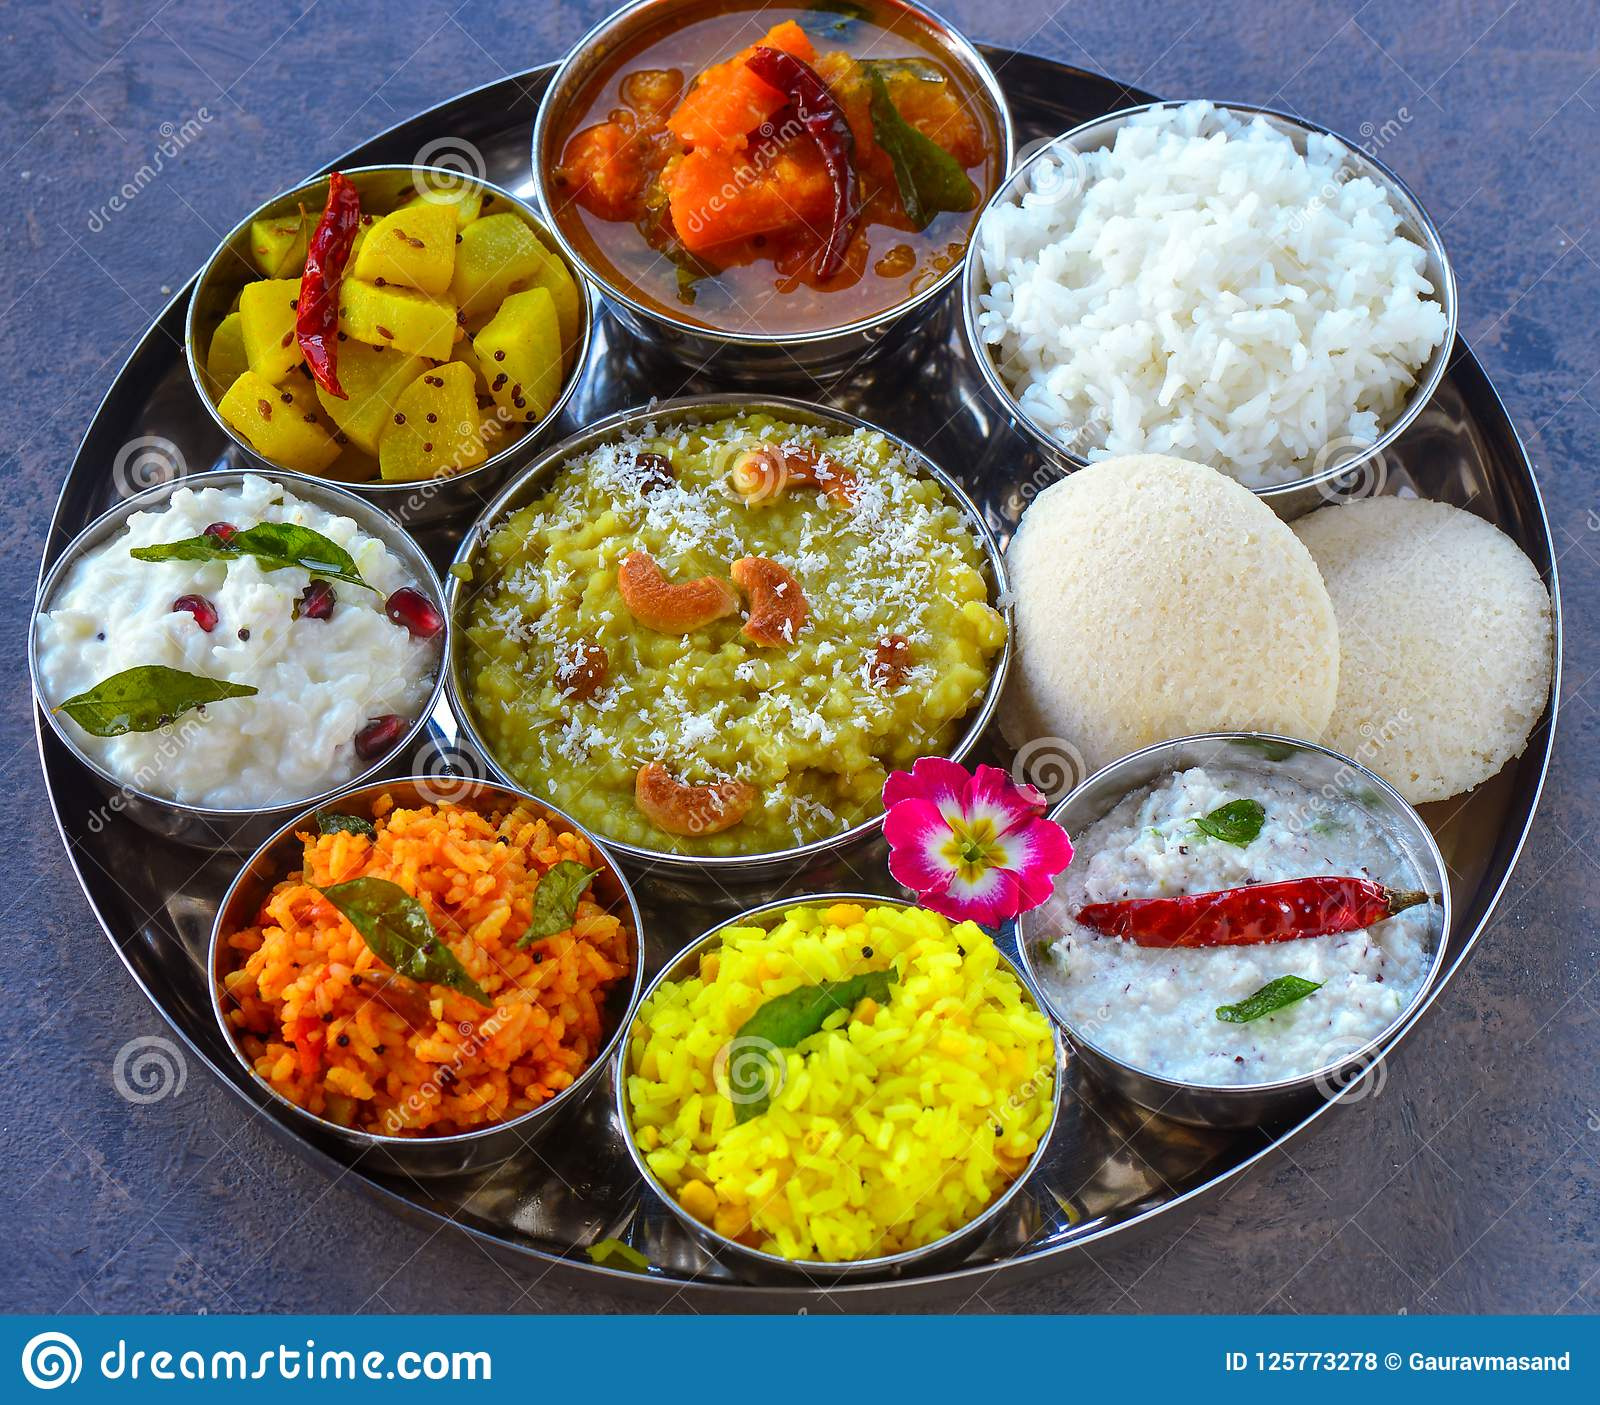 South Indian Telugu Platter Thaali Stock Photo - Image of fresh, asian:  125773278